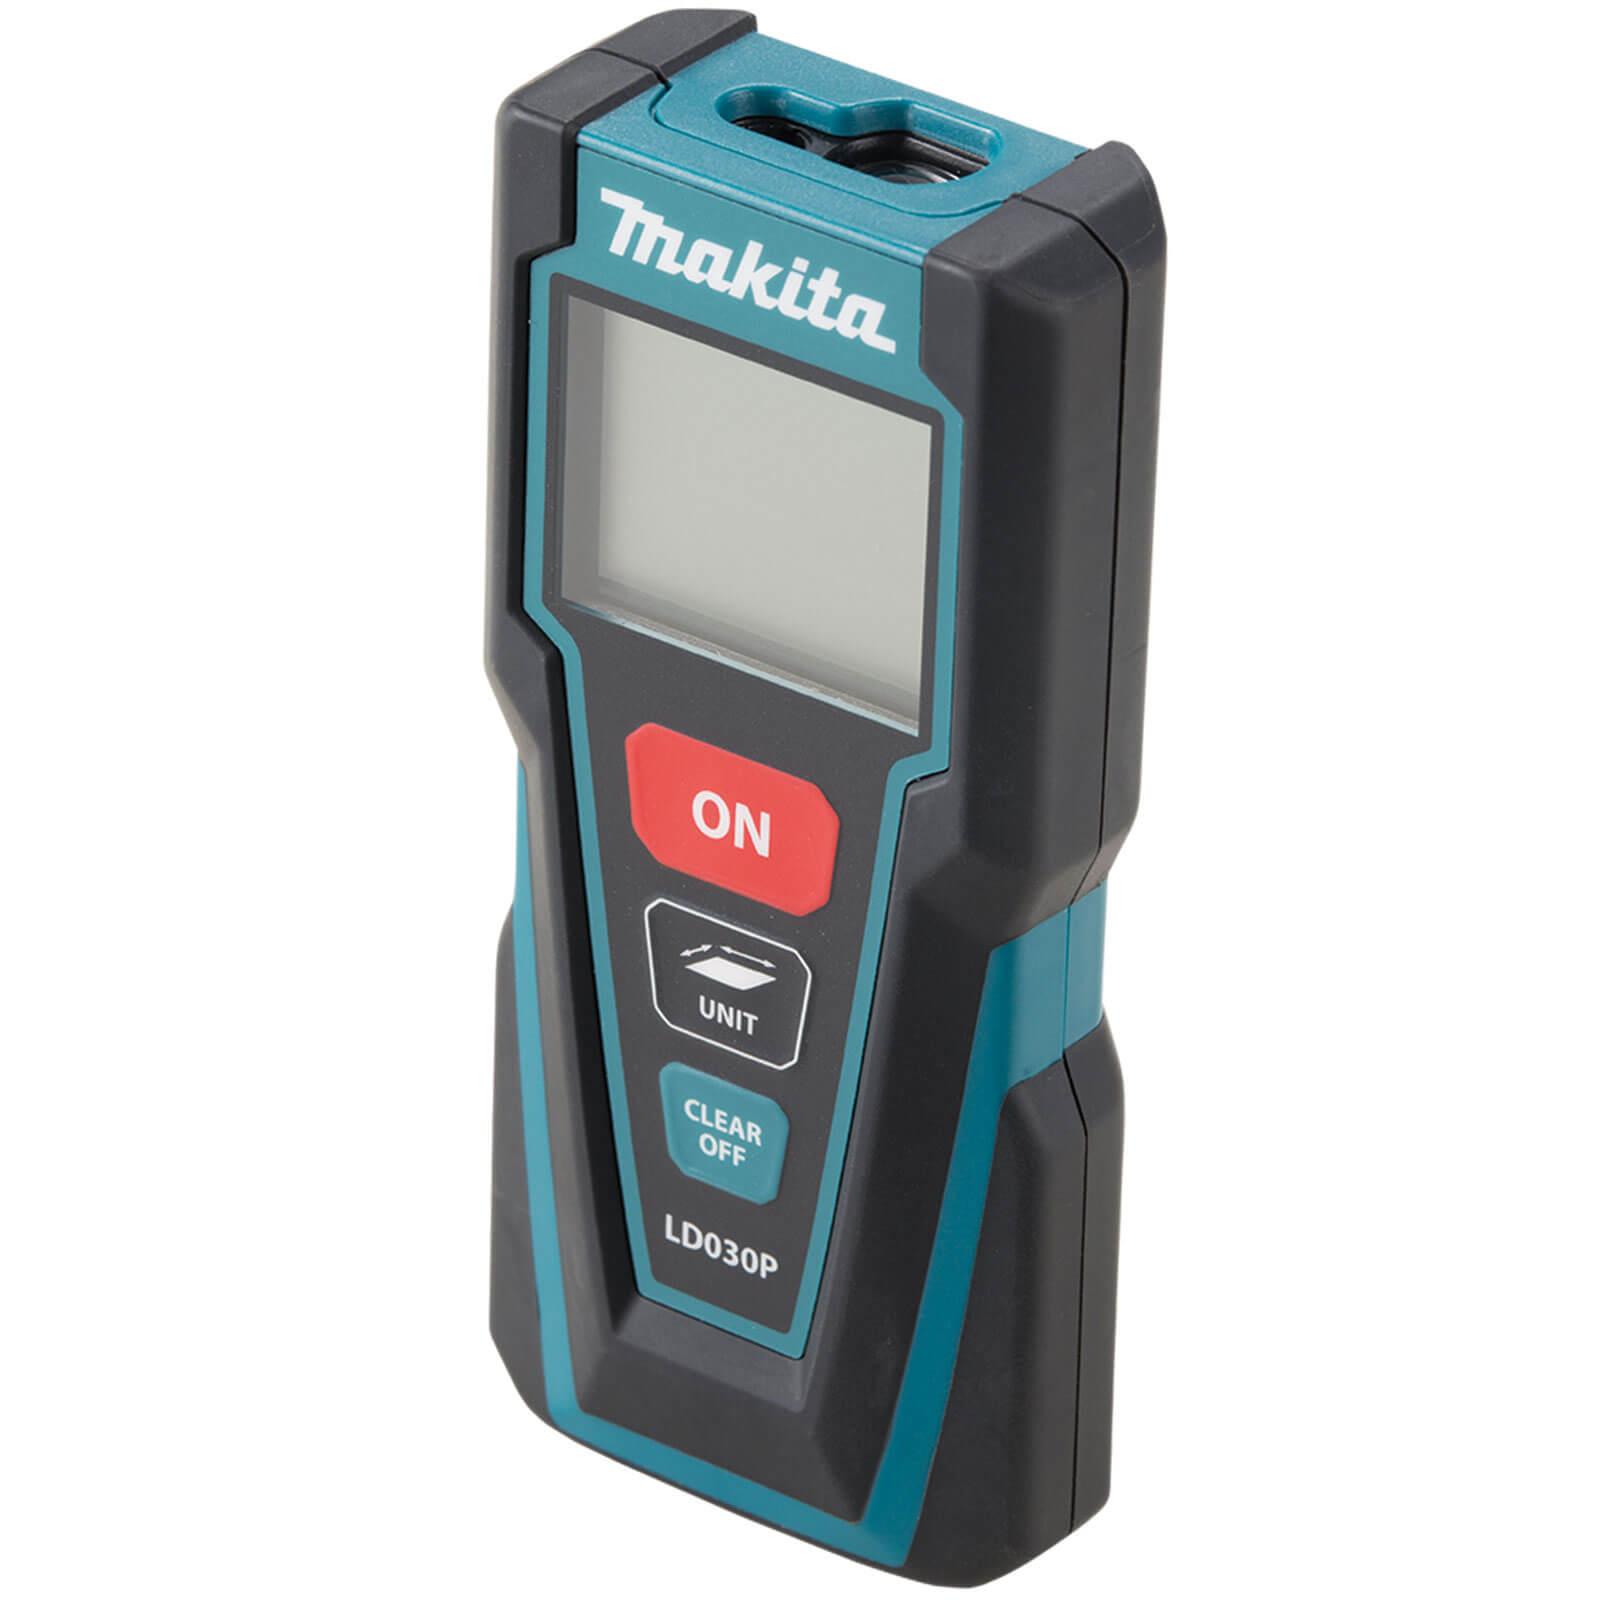 Makita LD030P Laser Distance Measure 30M